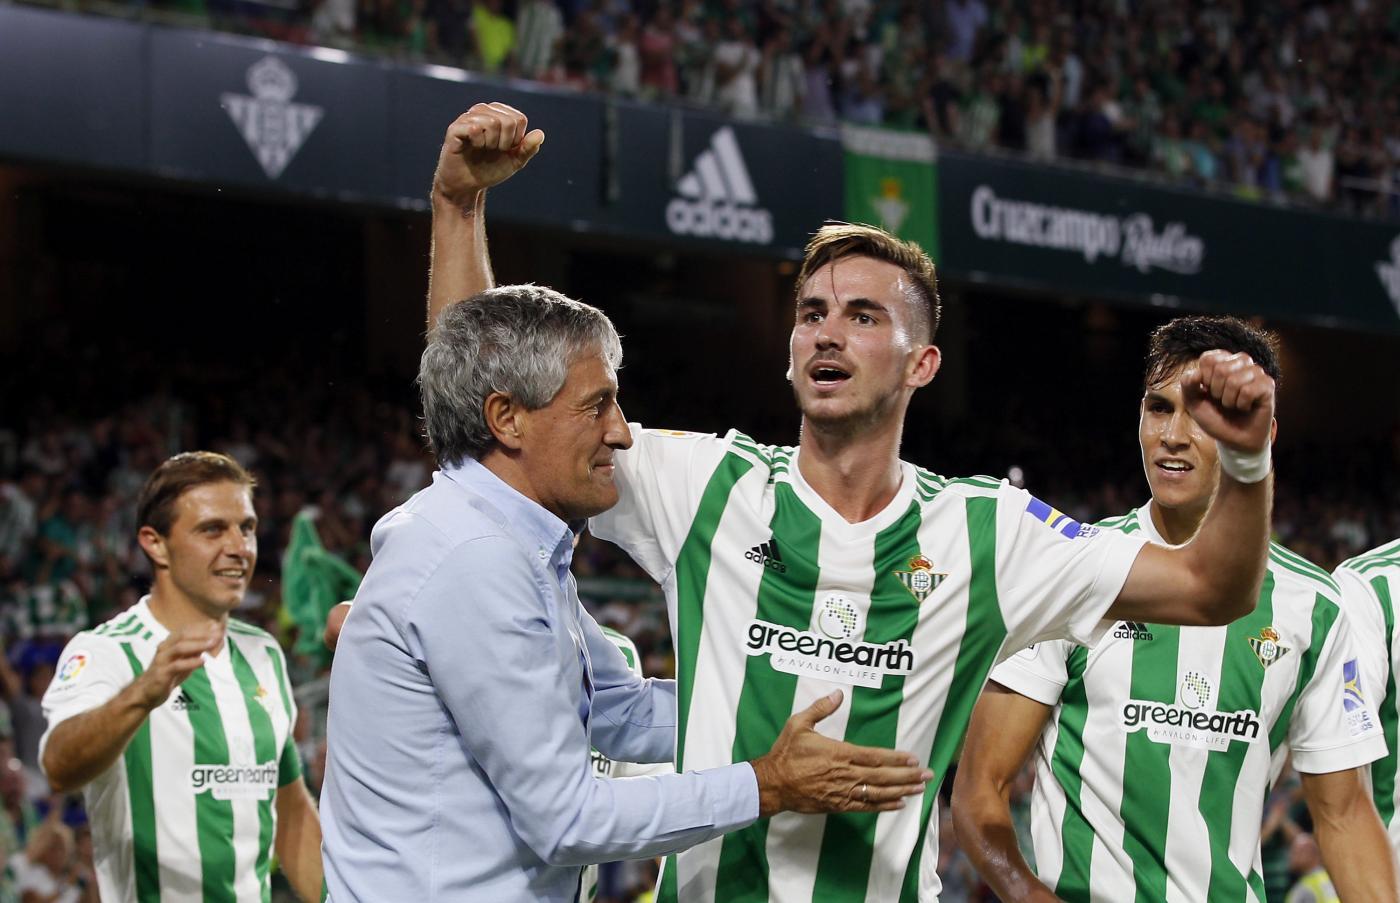 Real Betis 4 - 0 Levante: Betis batter Levante to reach fift